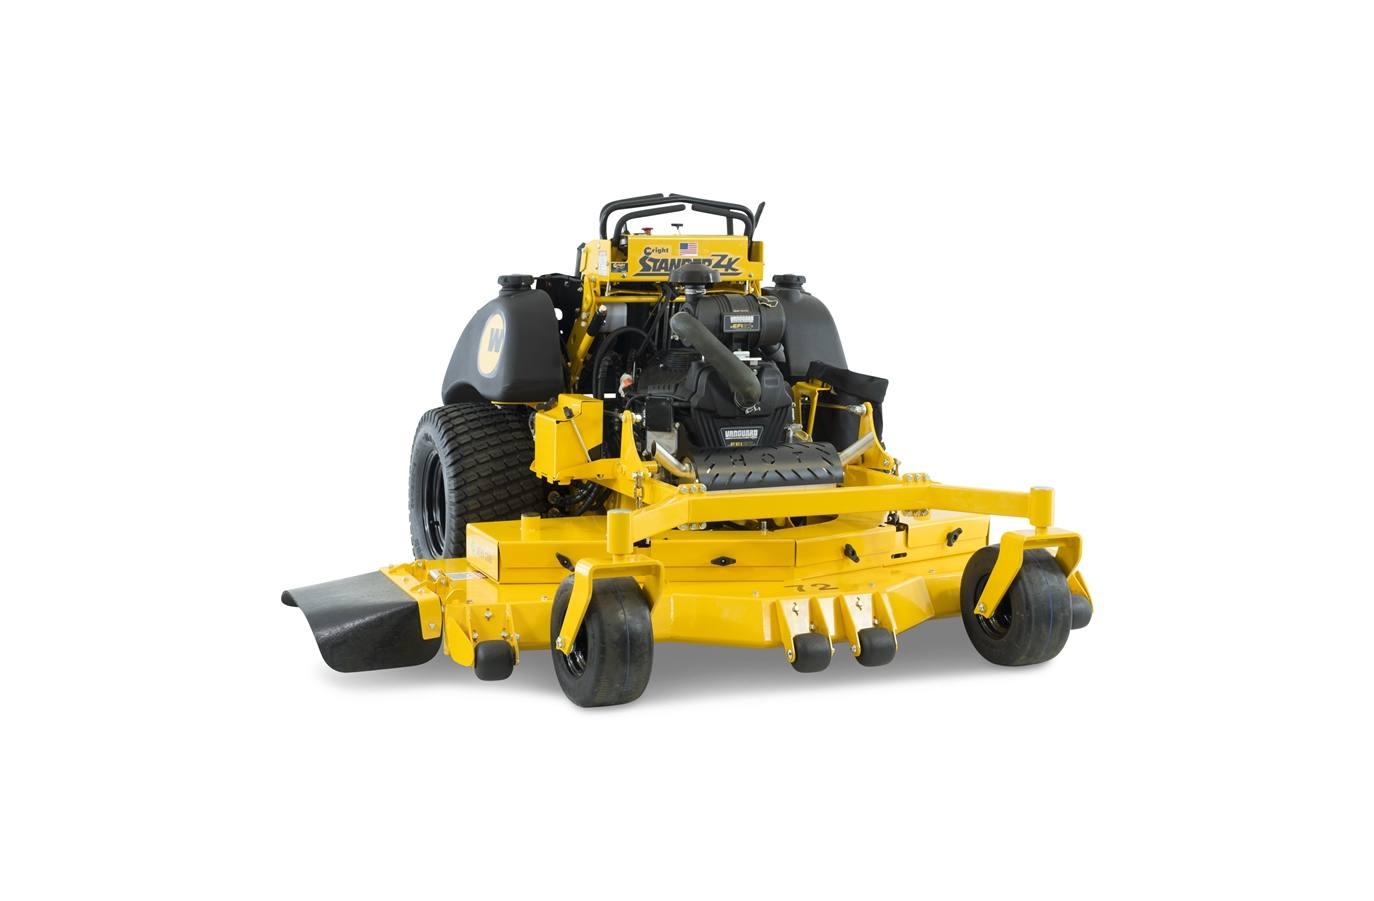 2018 Wright Stander ZK 72 61E8 for sale | Still's Power Equipment 1 (888)  621-1100